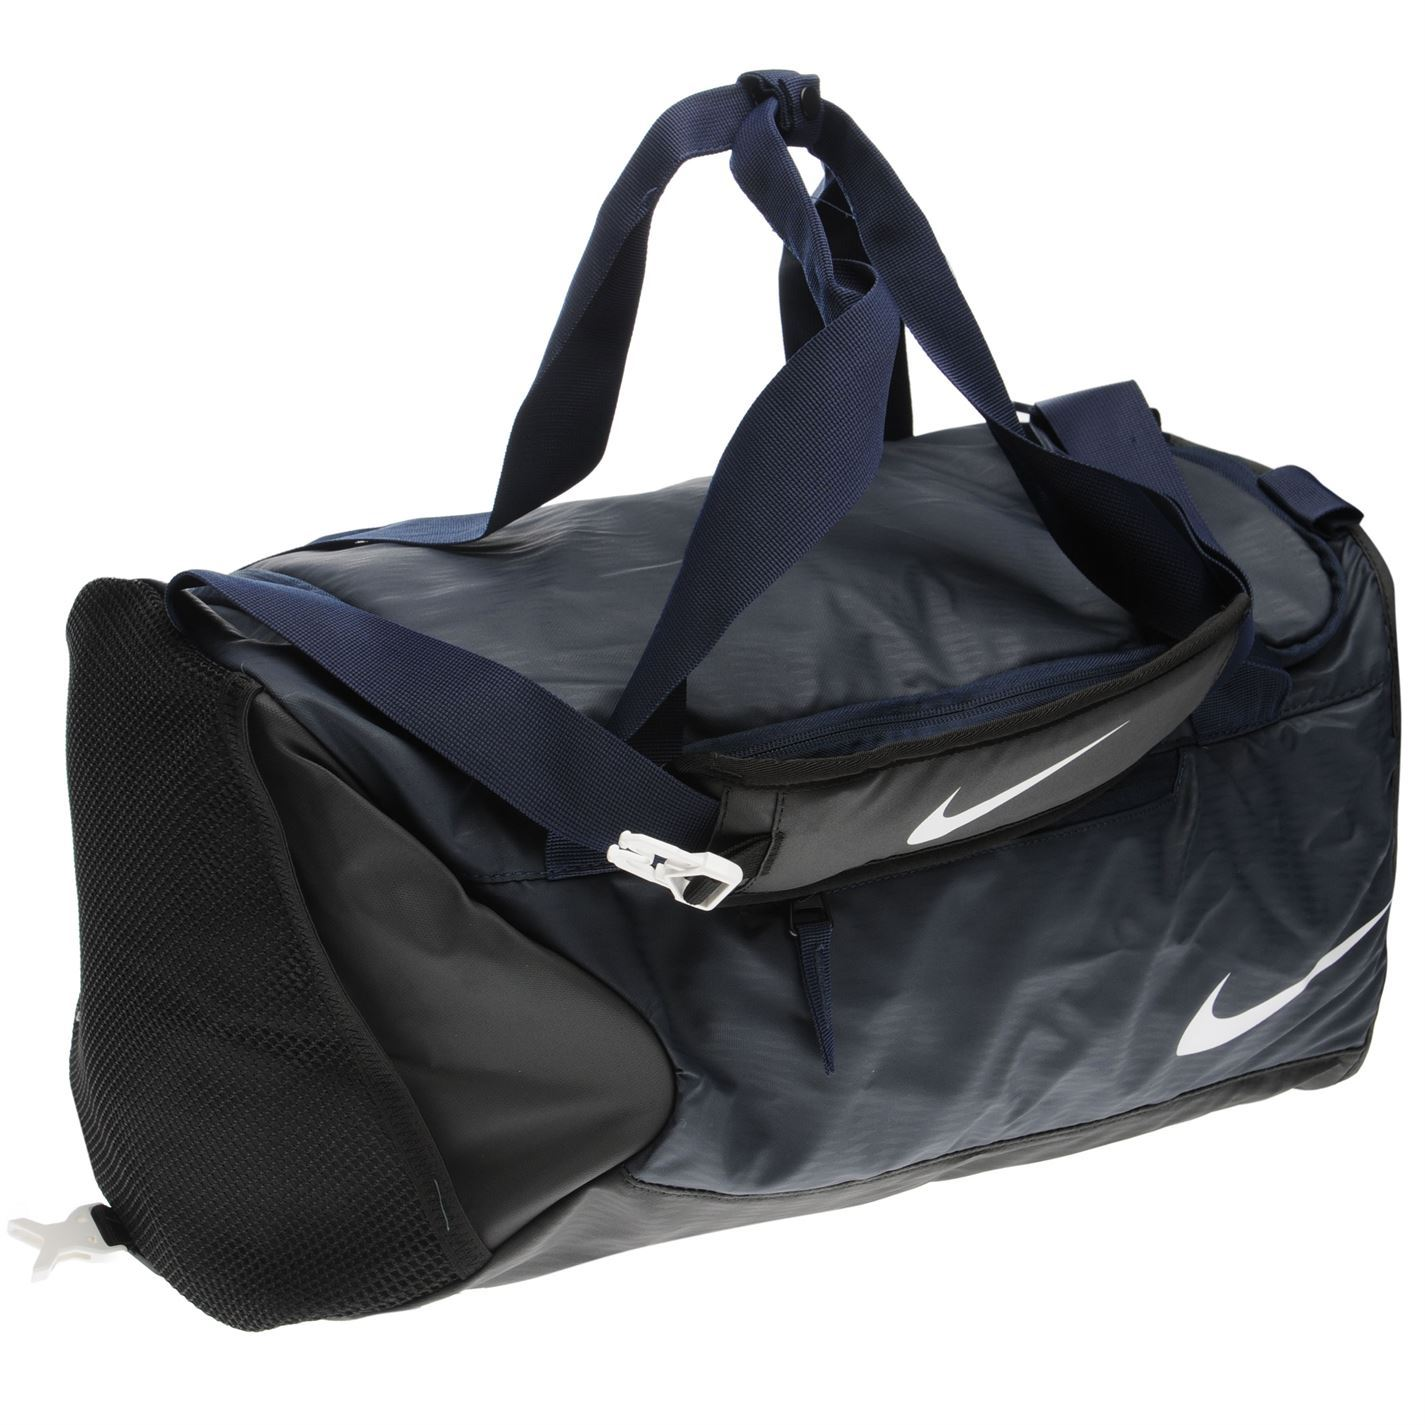 578fbd485a86 Nike Duffel Bag Carryall Holdall Barrel Bag Daybag Kitbag Gymbag